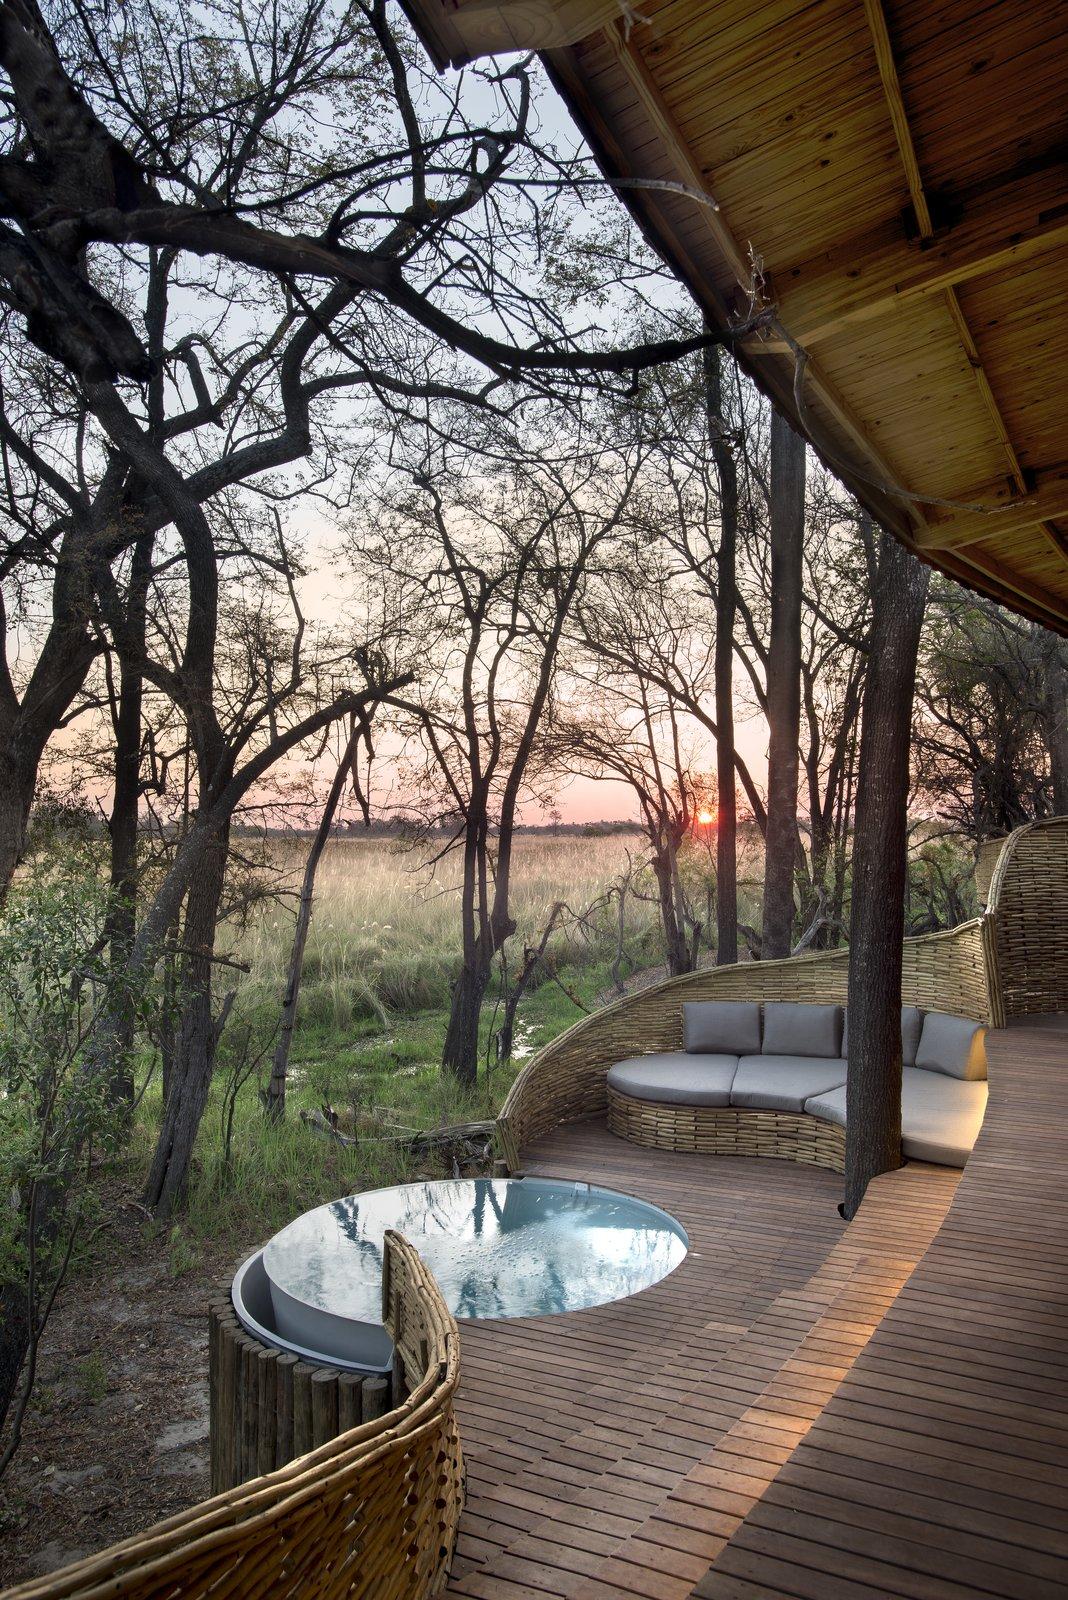 Photo 9 of 13 in Eco-Friendly Safari Lodge in Africa's Okavango Delta